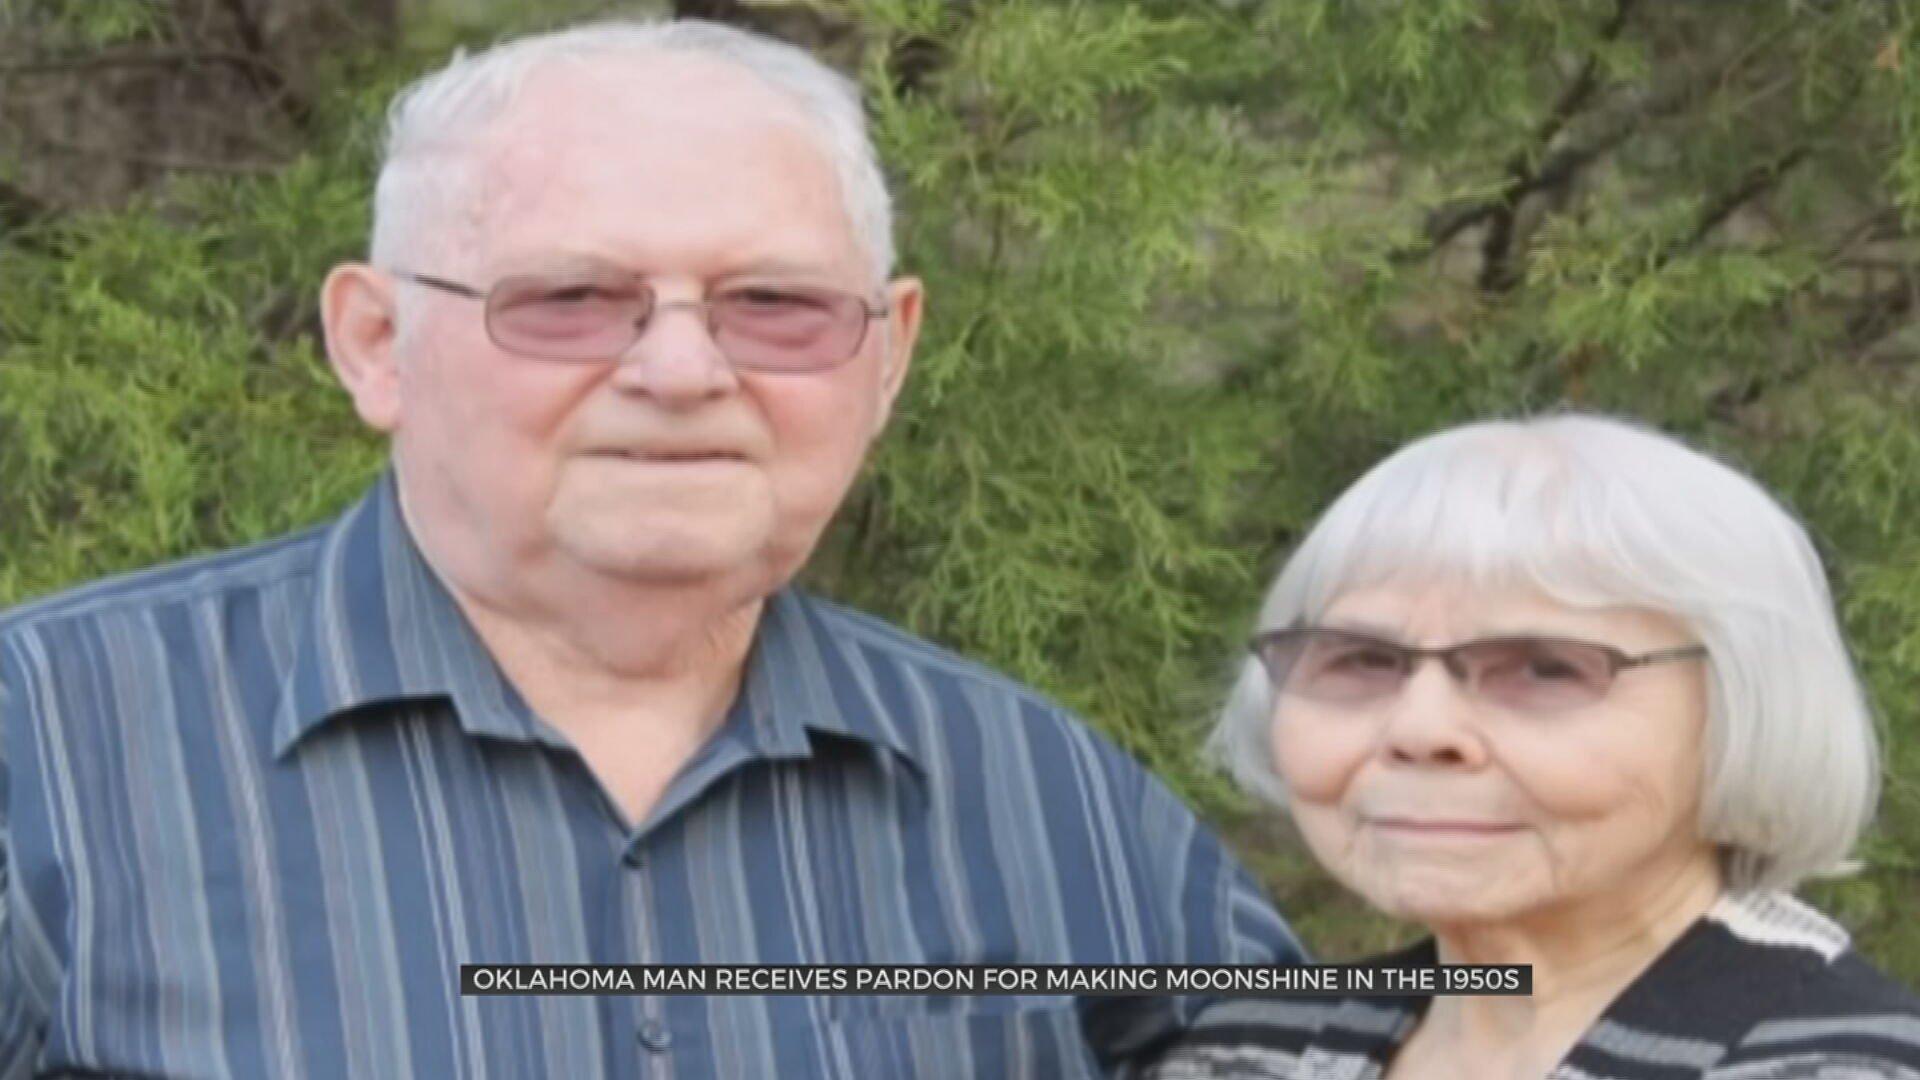 Oklahoma Man Receives Presidential Pardon For Making Moonshine In 1950s